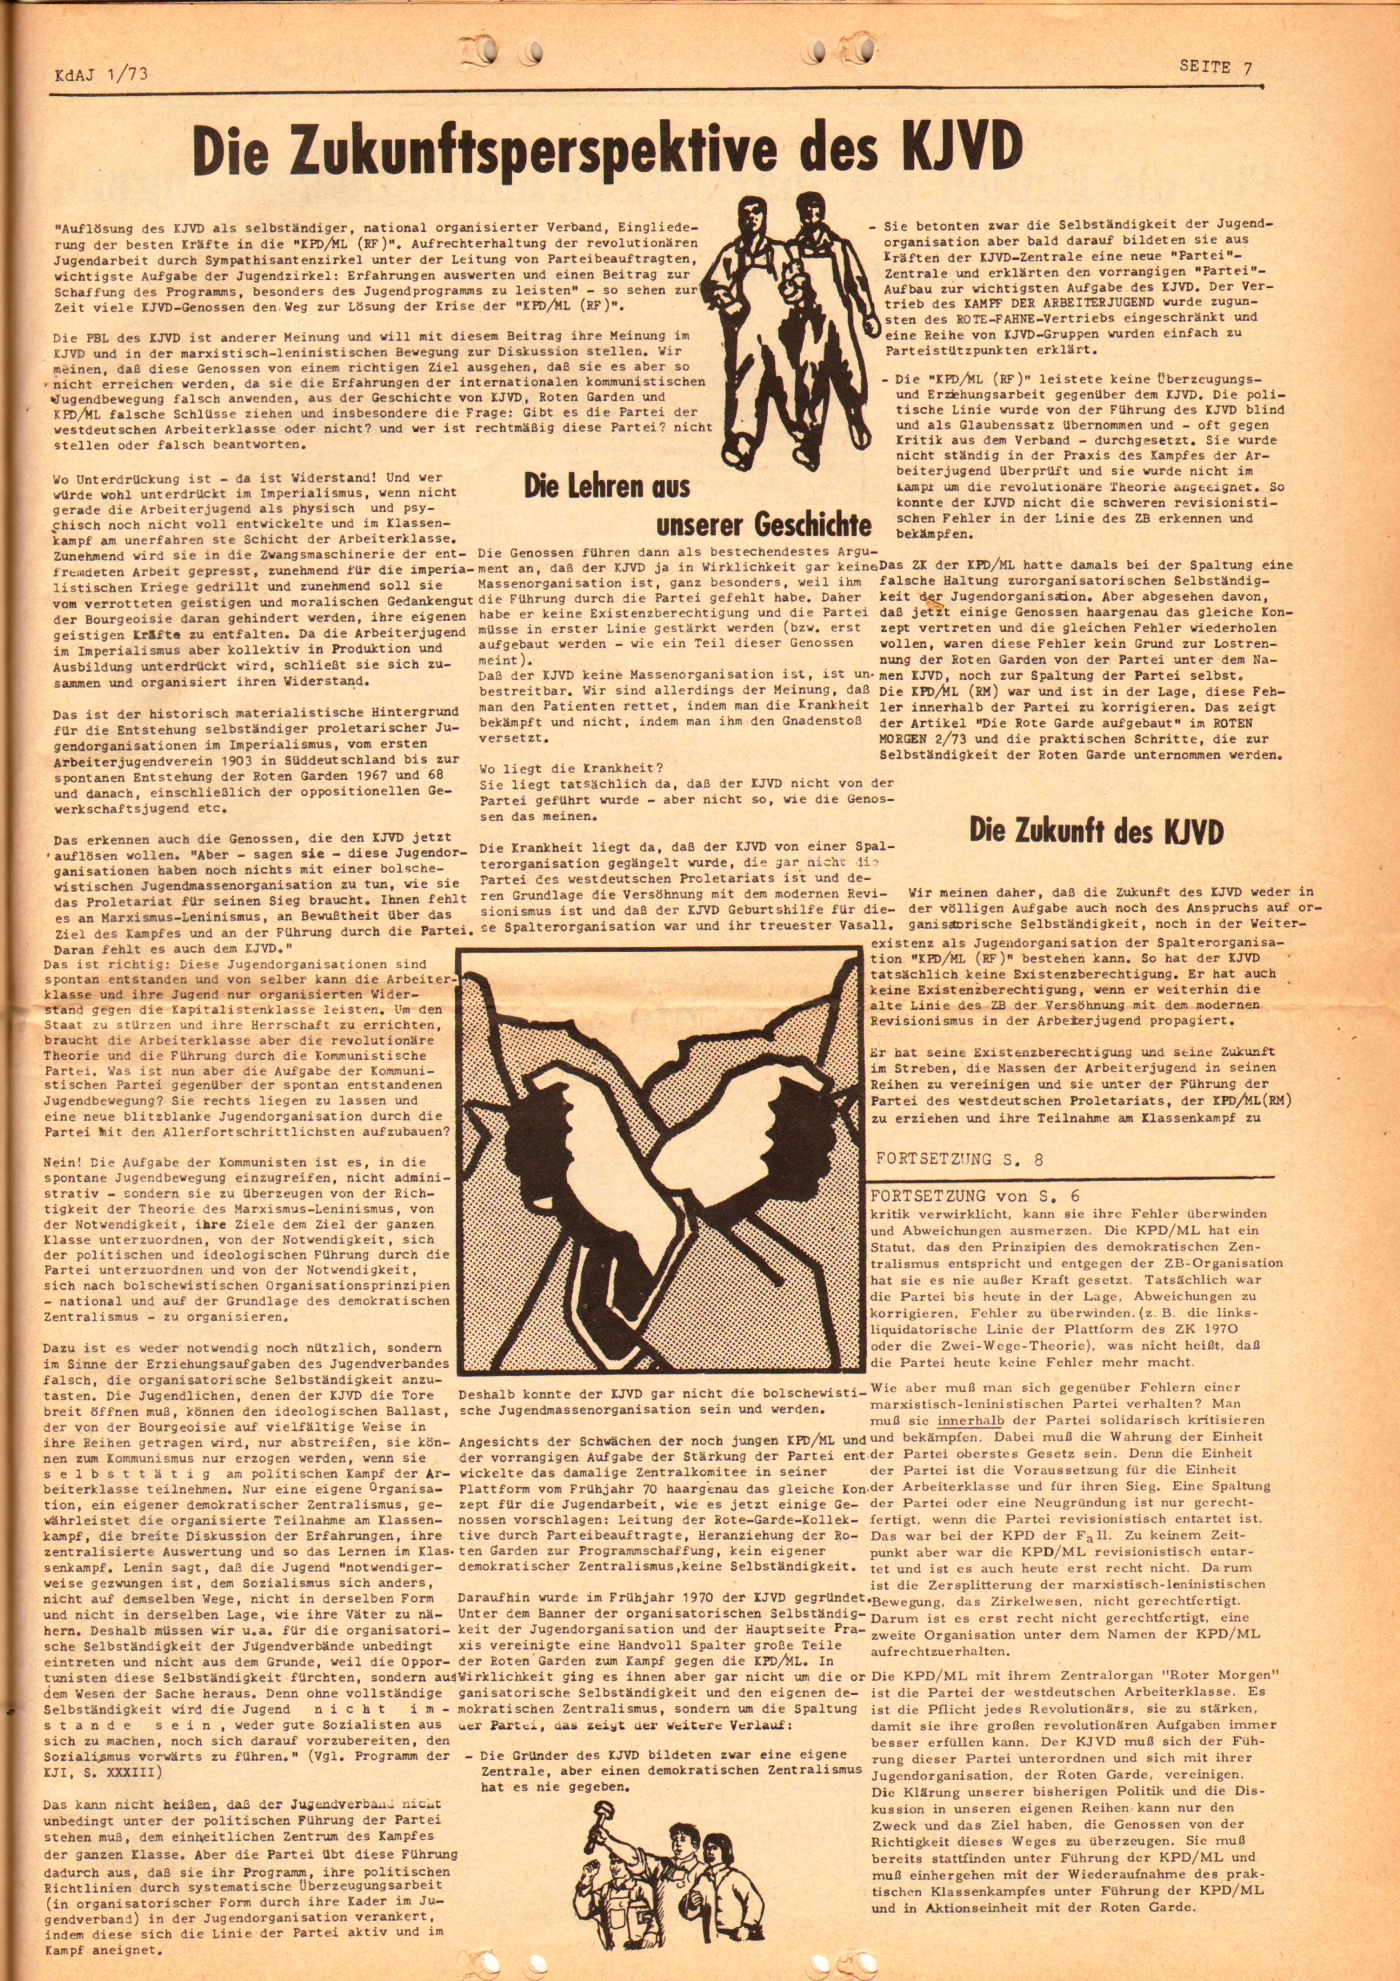 KDAJ, 4. Jg., März 1973, Nr. 1, Seite 7